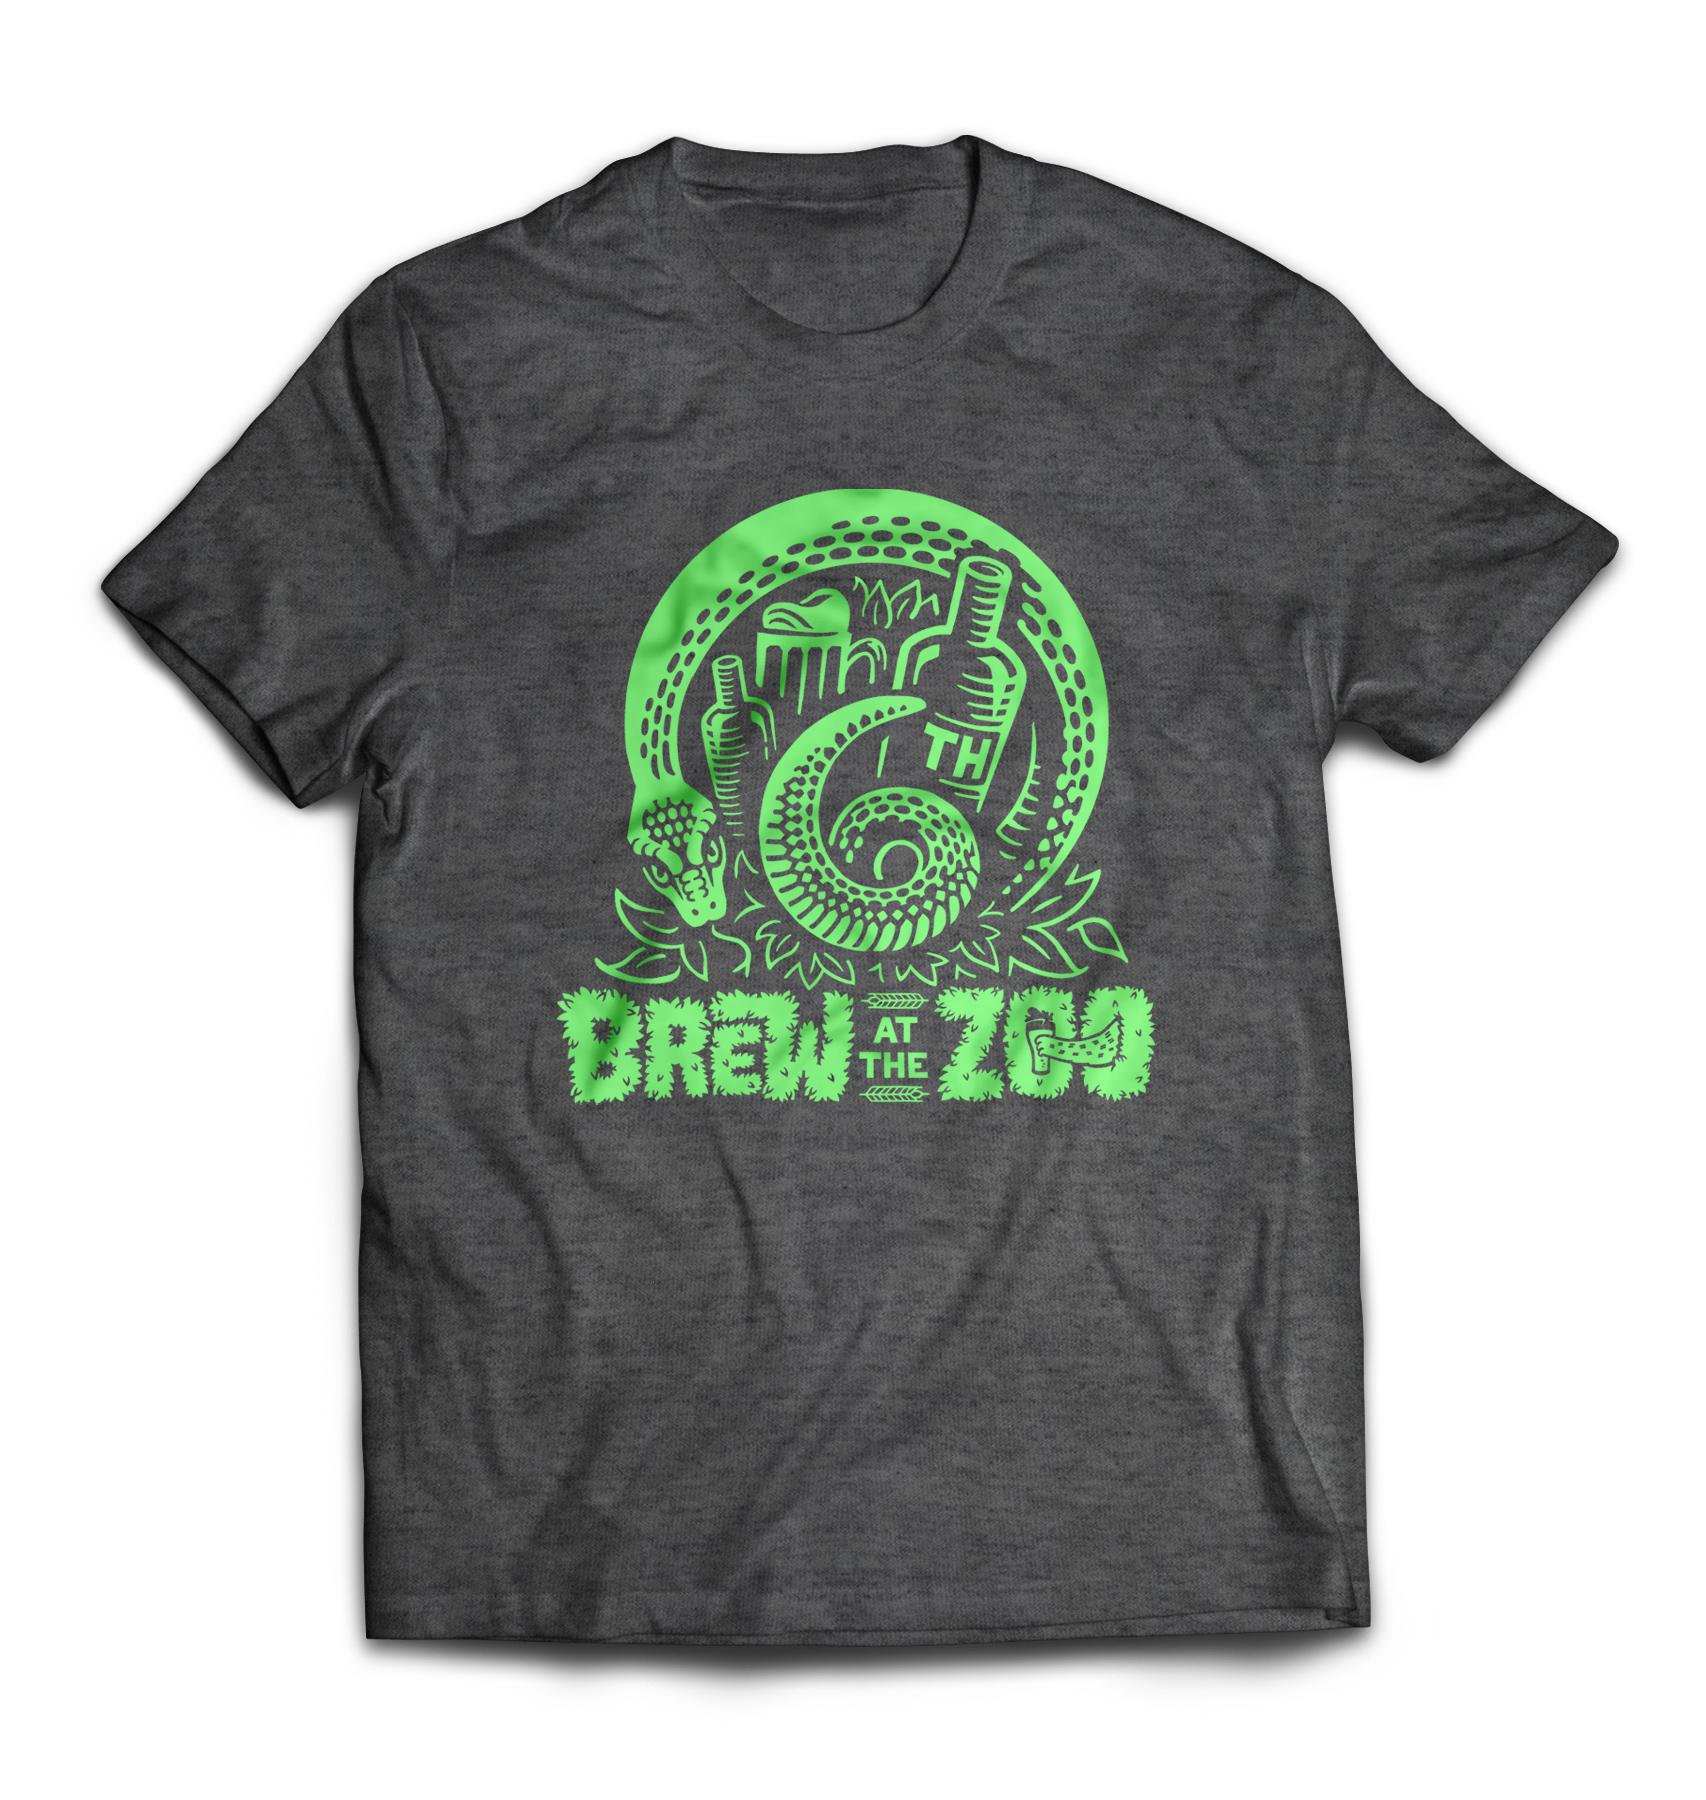 brz-2019-shirt.jpg